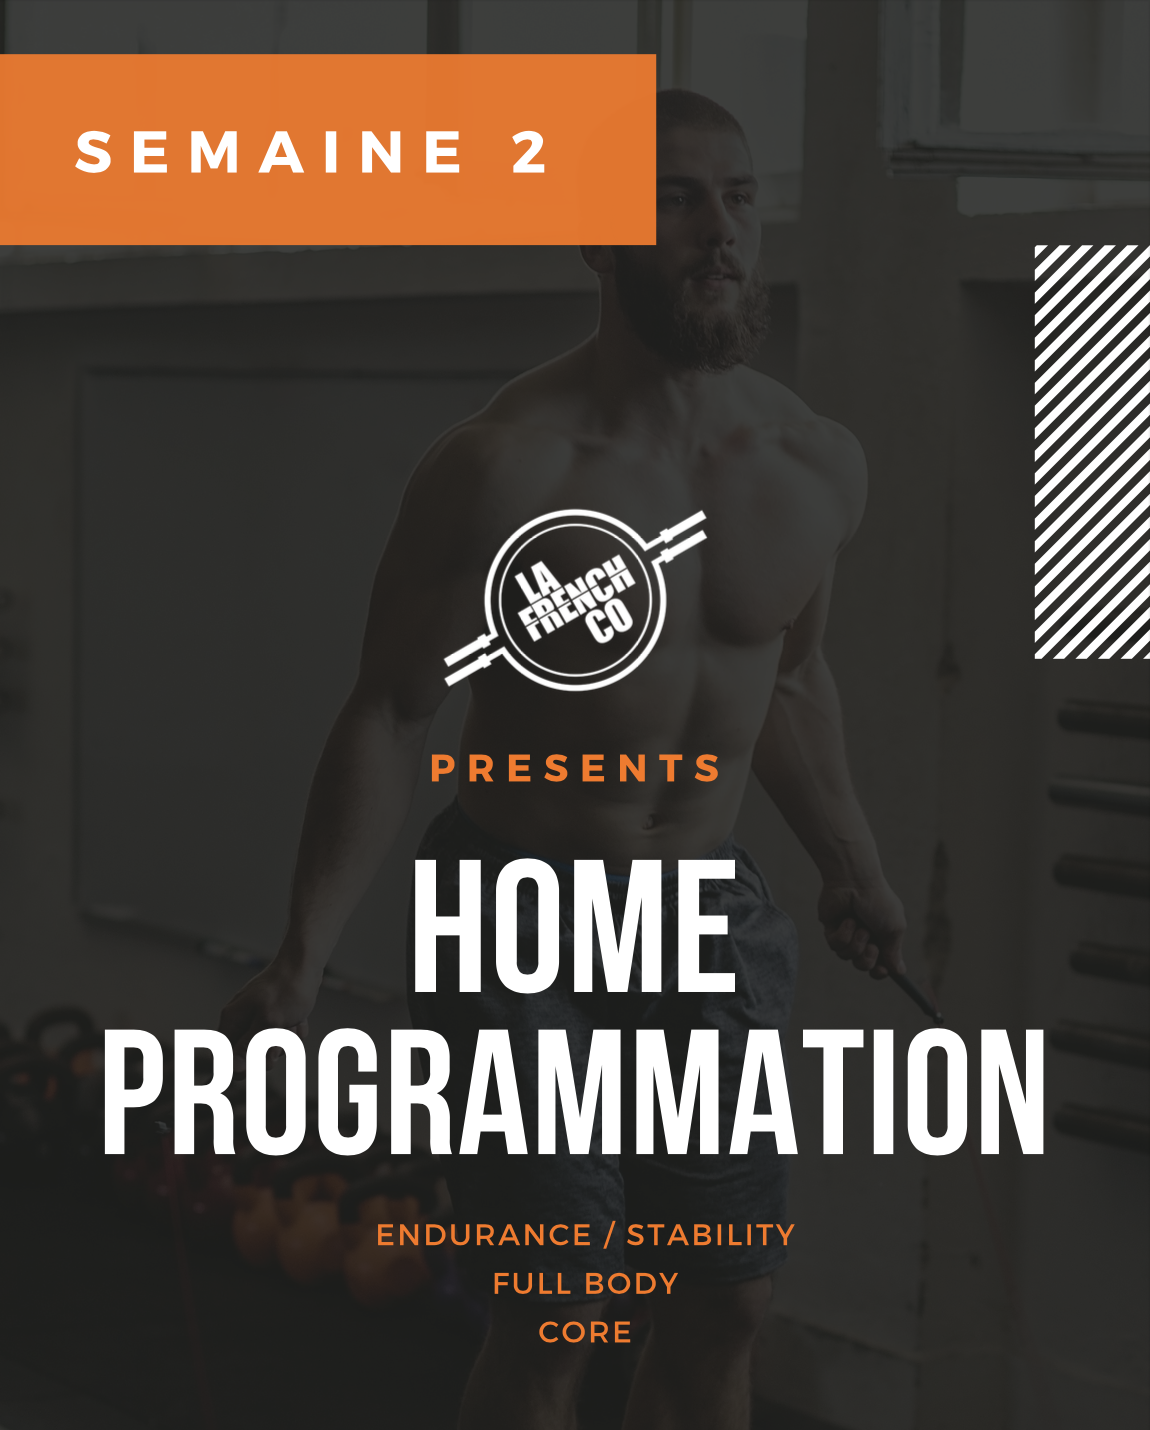 Home Prog, Cycle 4, semaine 2